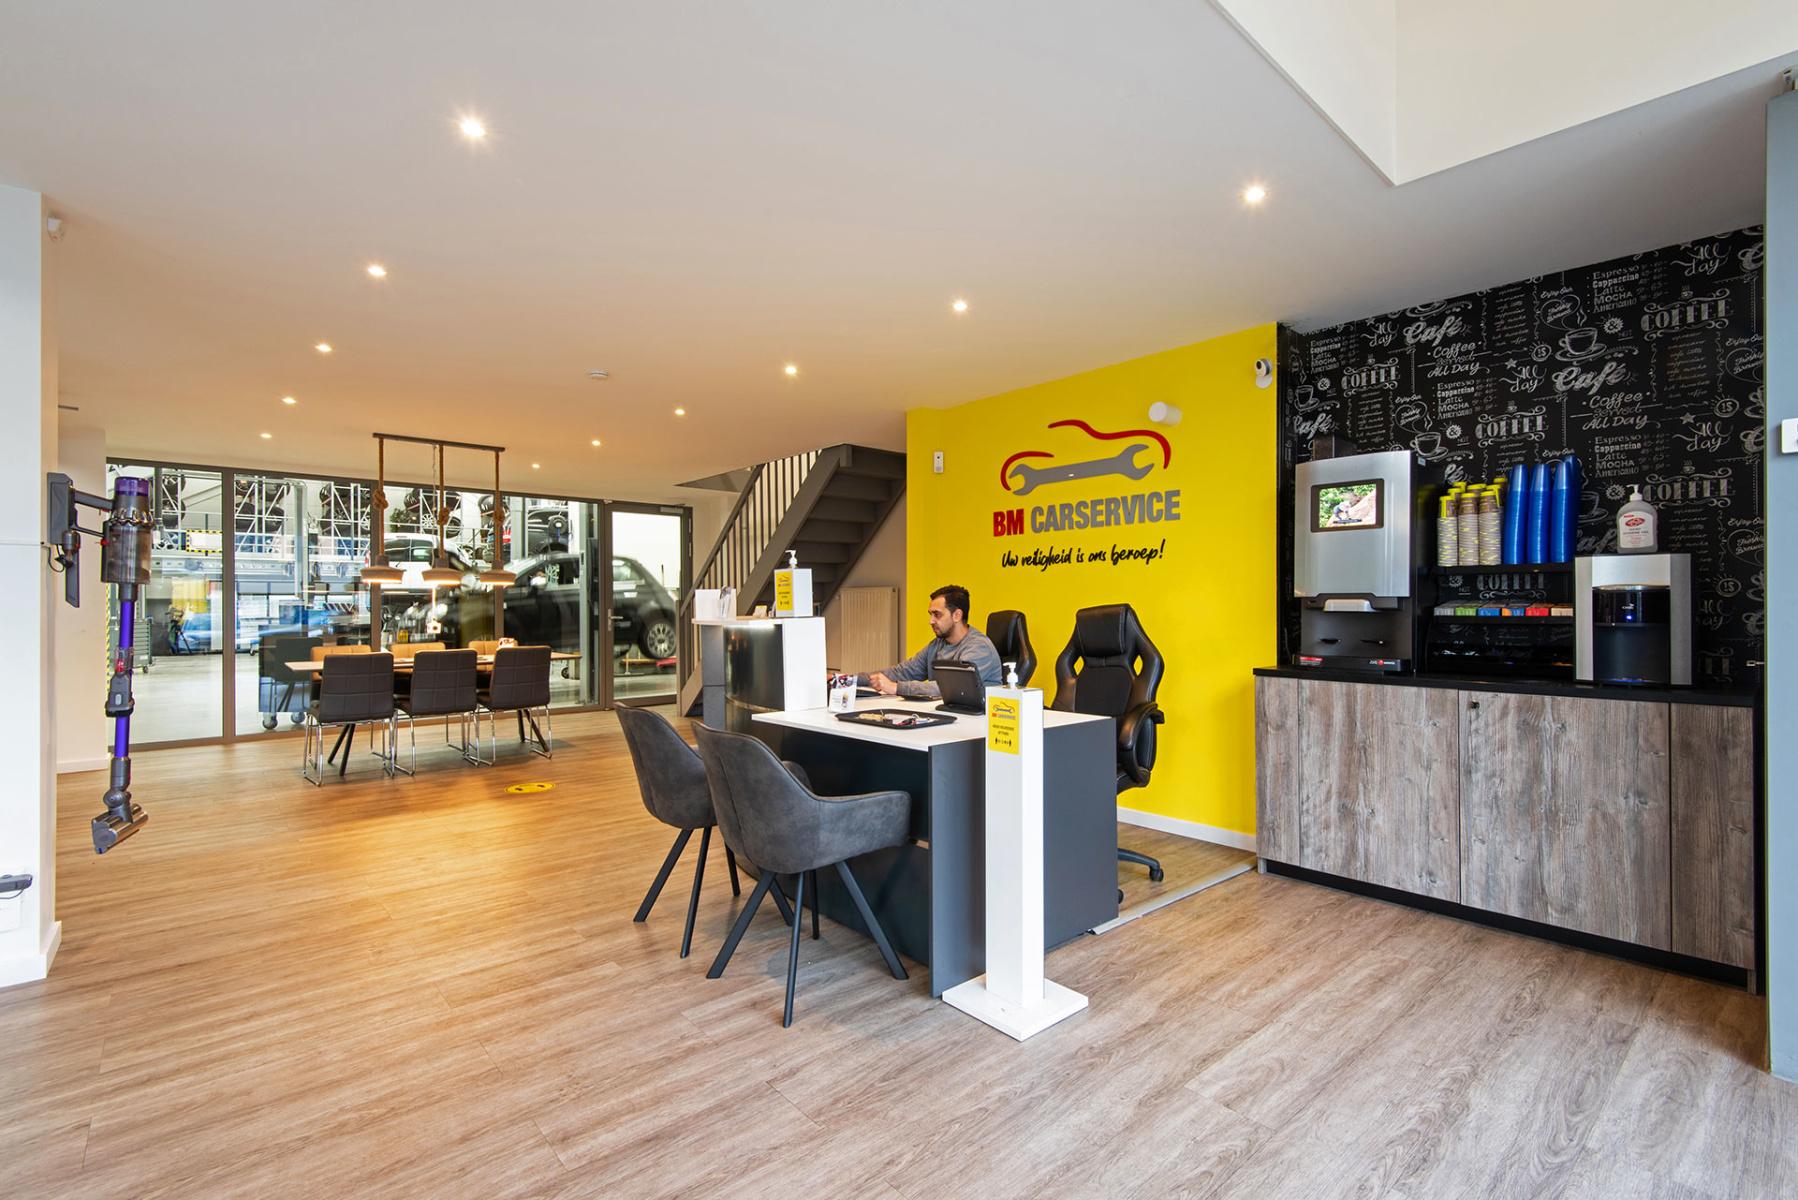 Auto garage Amstelveen - Uithoorn - Aalsmeer - Amsterdam-thumb